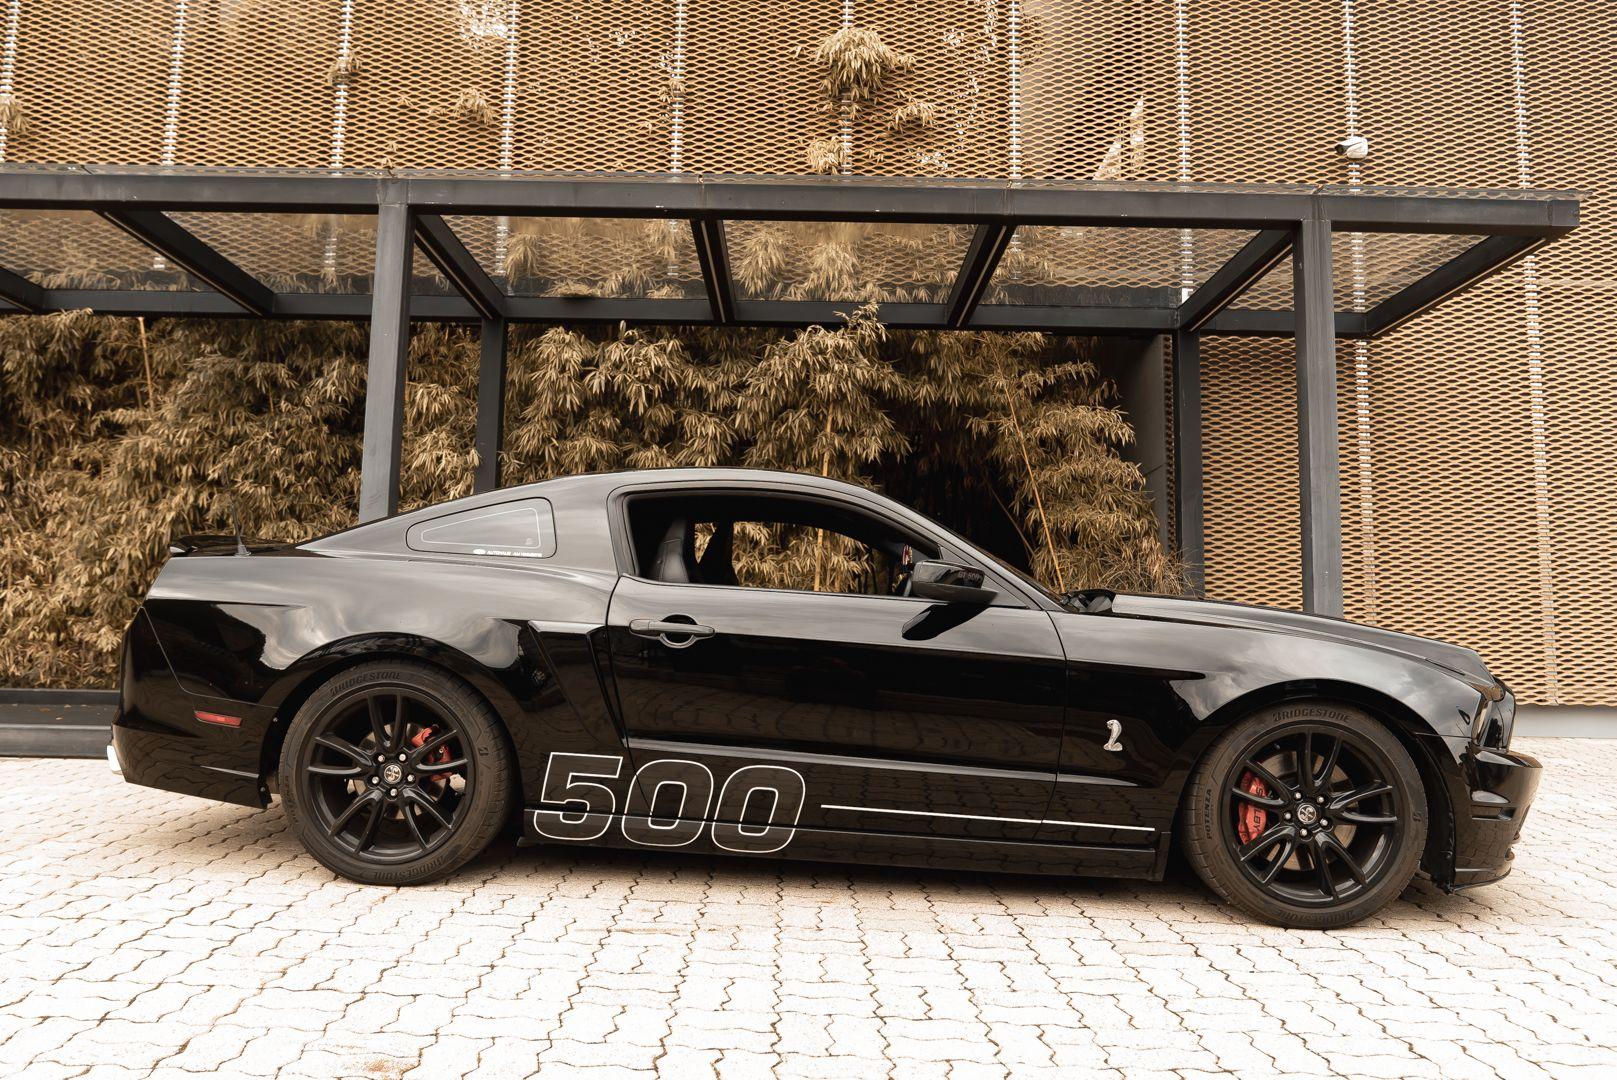 2012 Ford Mustang 5.0 V8 82061